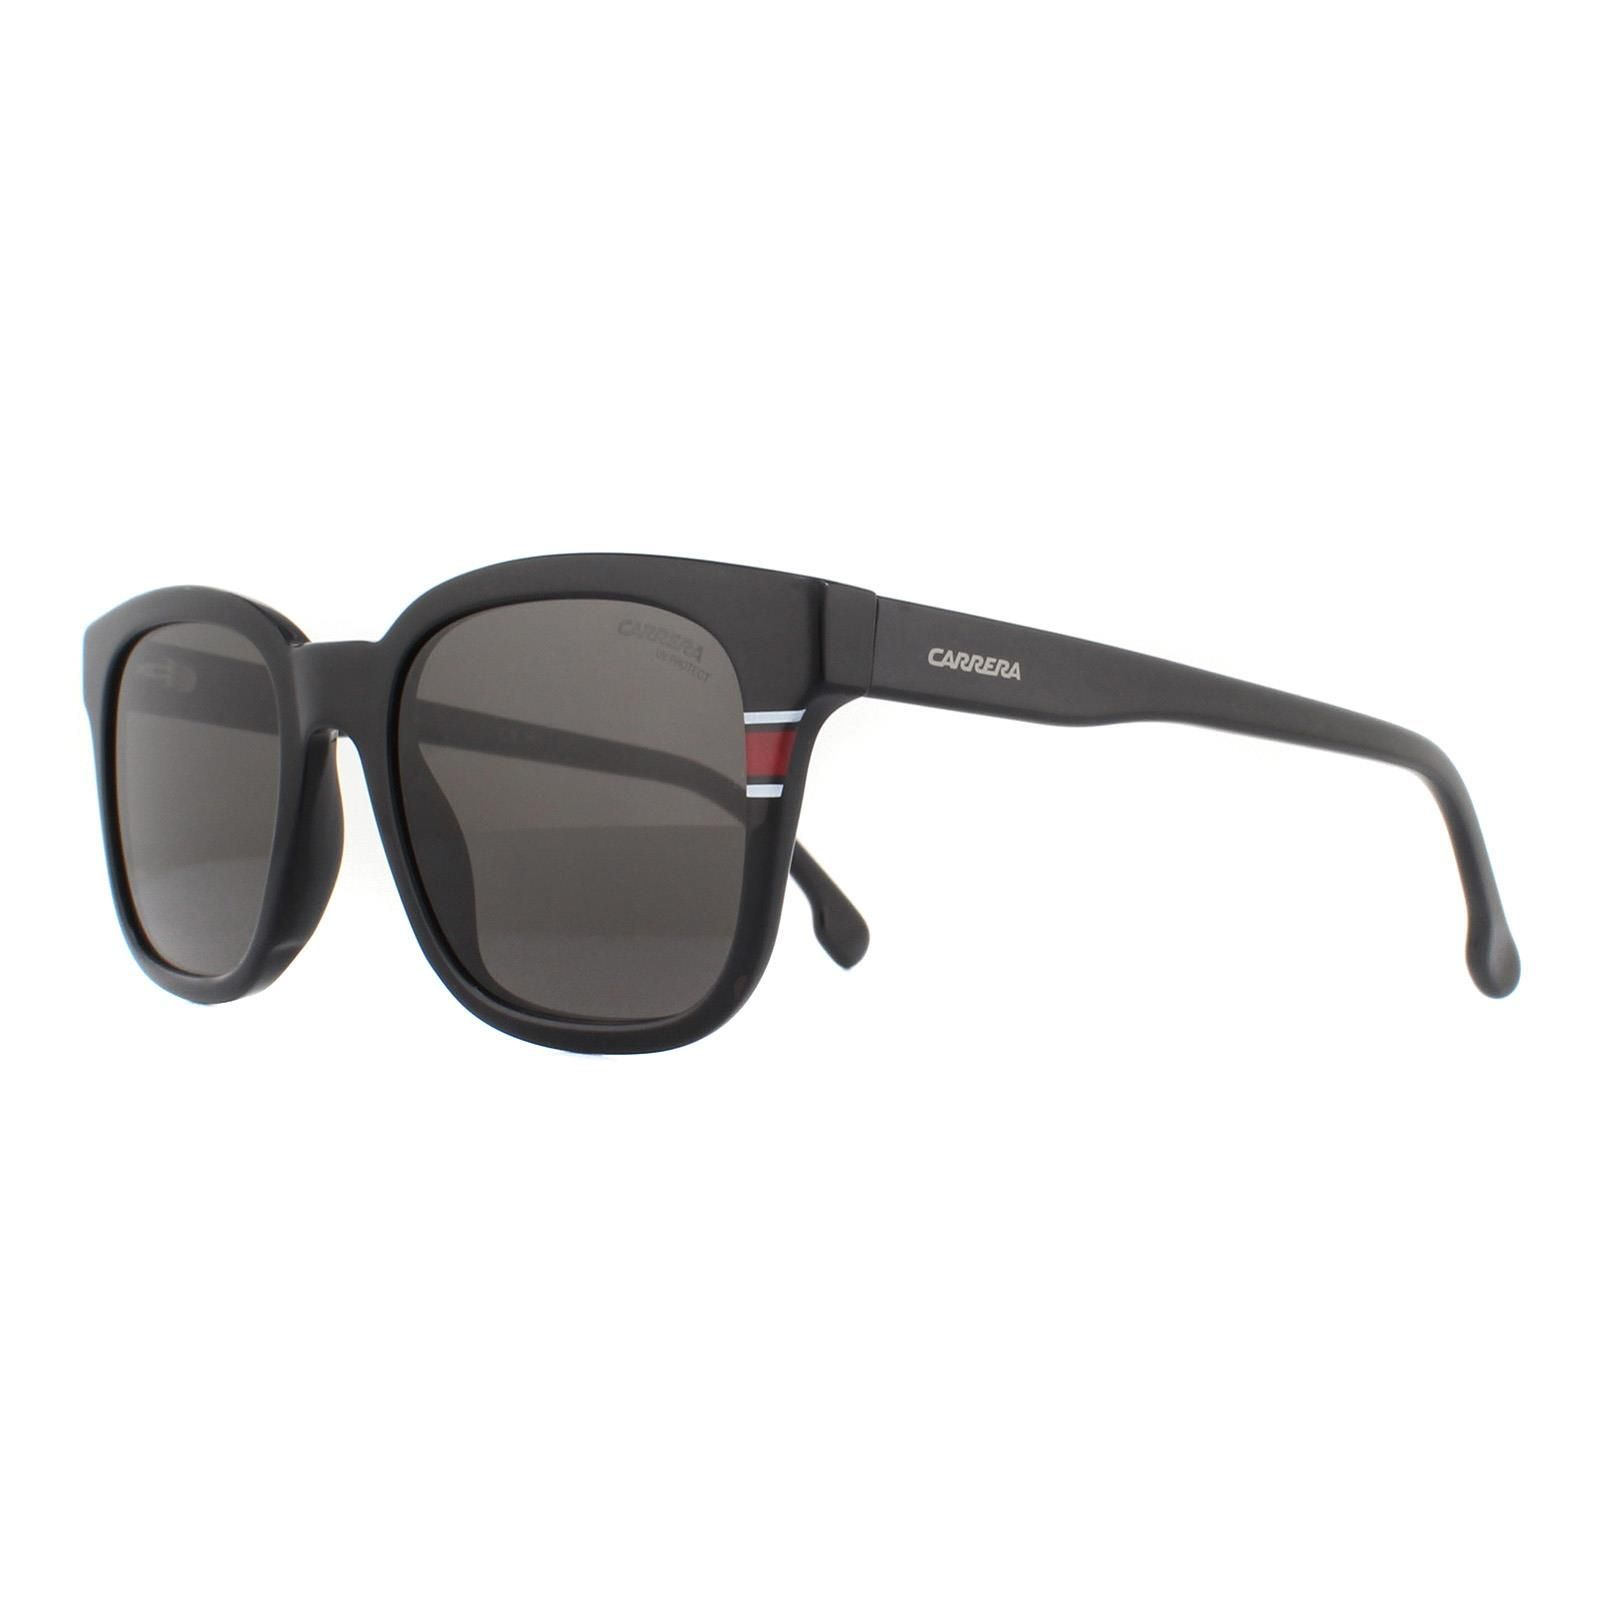 Carrera Sunglasses 164/S 807 IR Shiny Black Grey